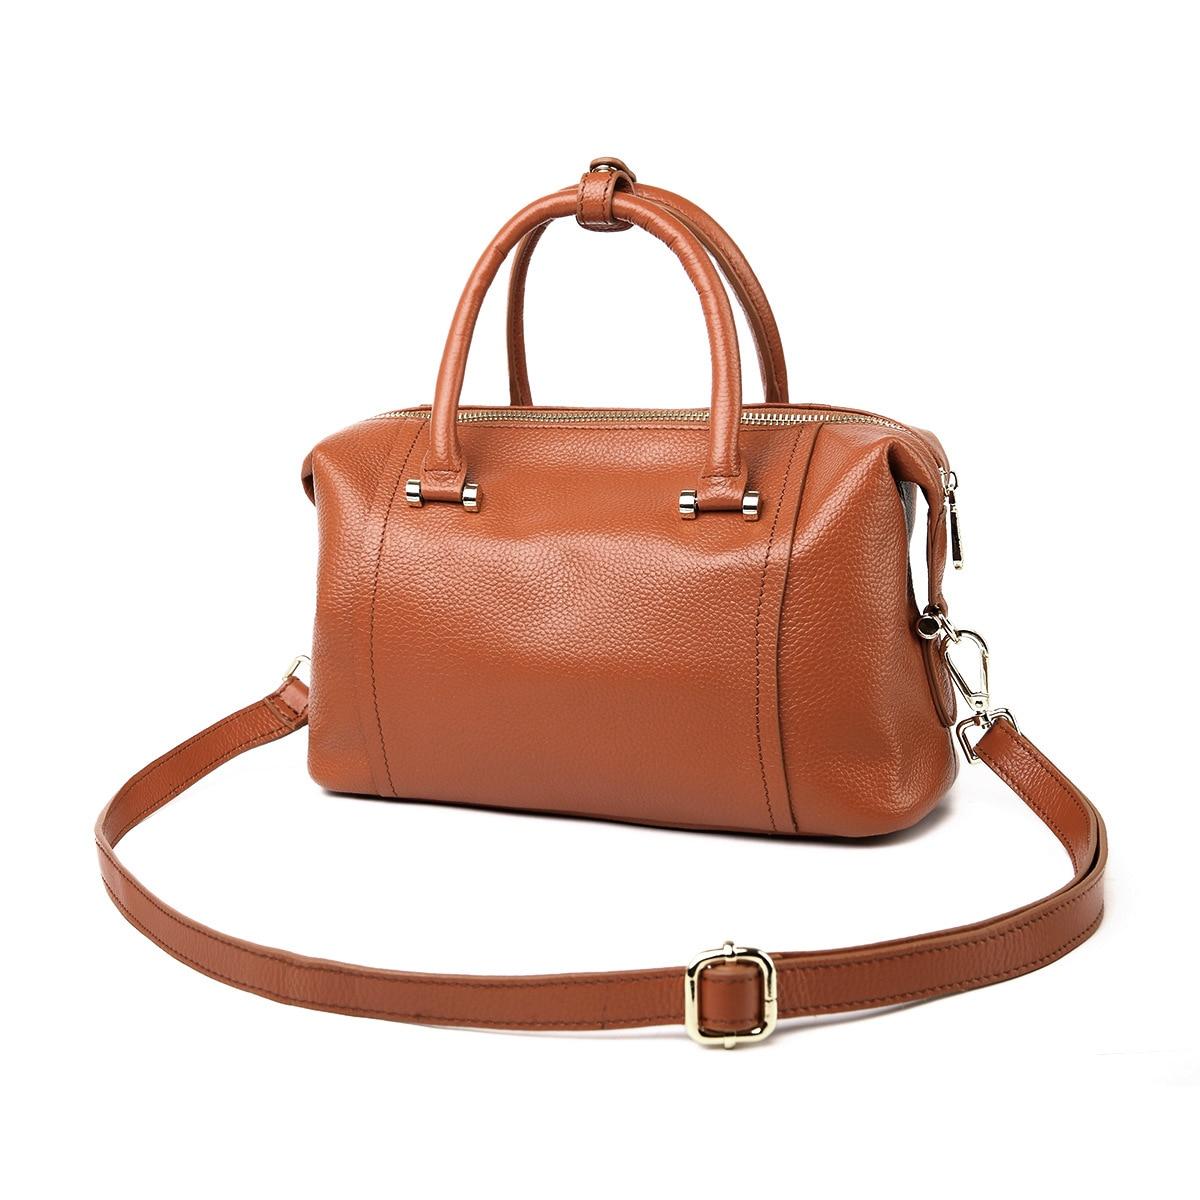 Online Get Cheap Cross Body Bags -Aliexpress.com   Alibaba Group